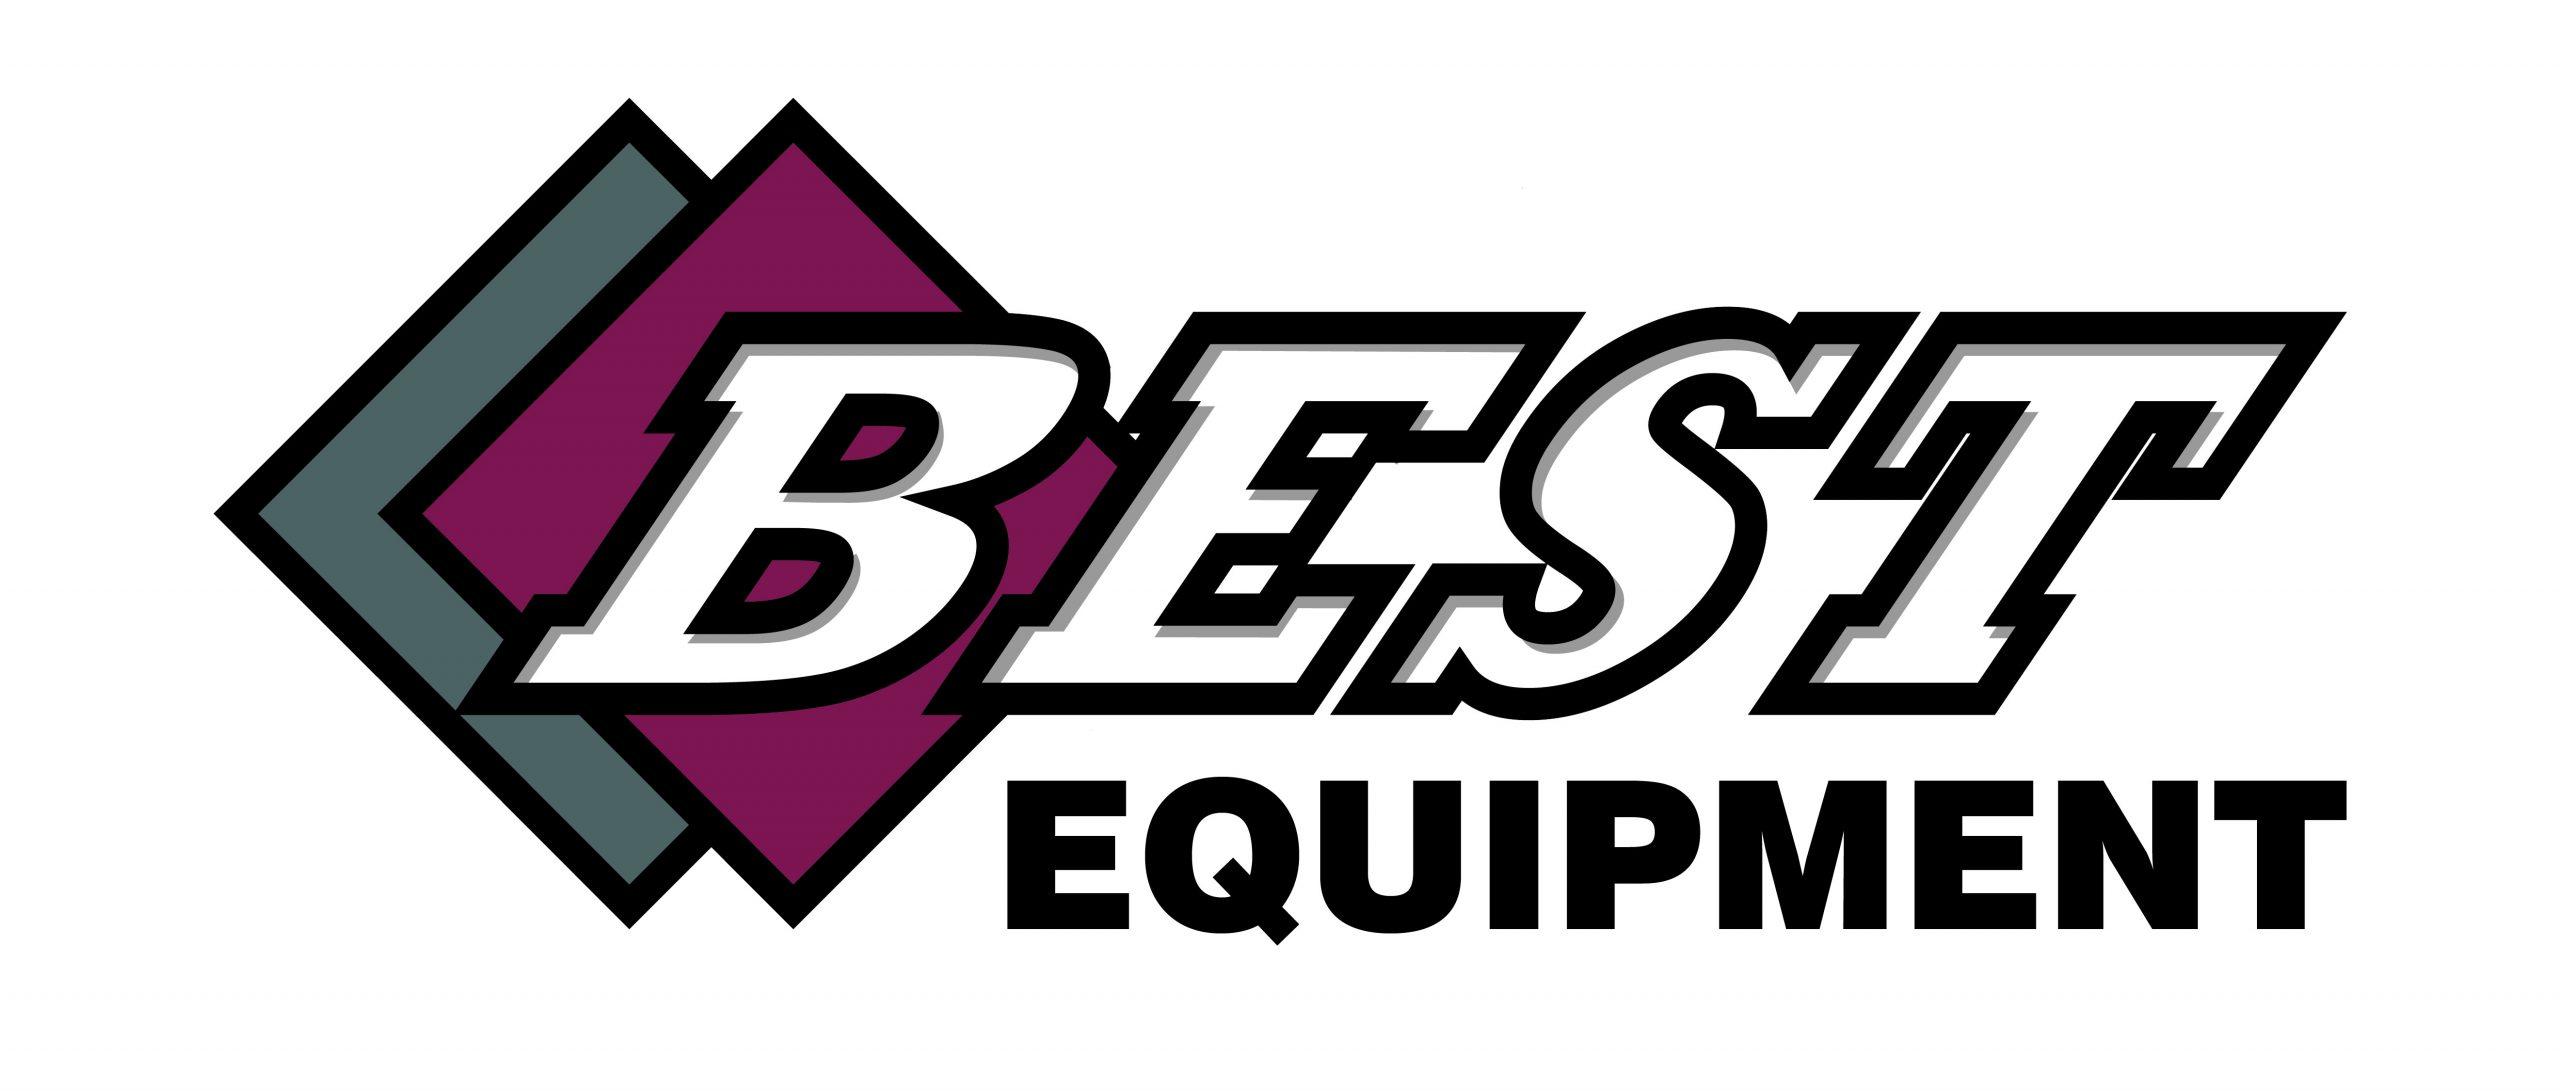 Best Equipment